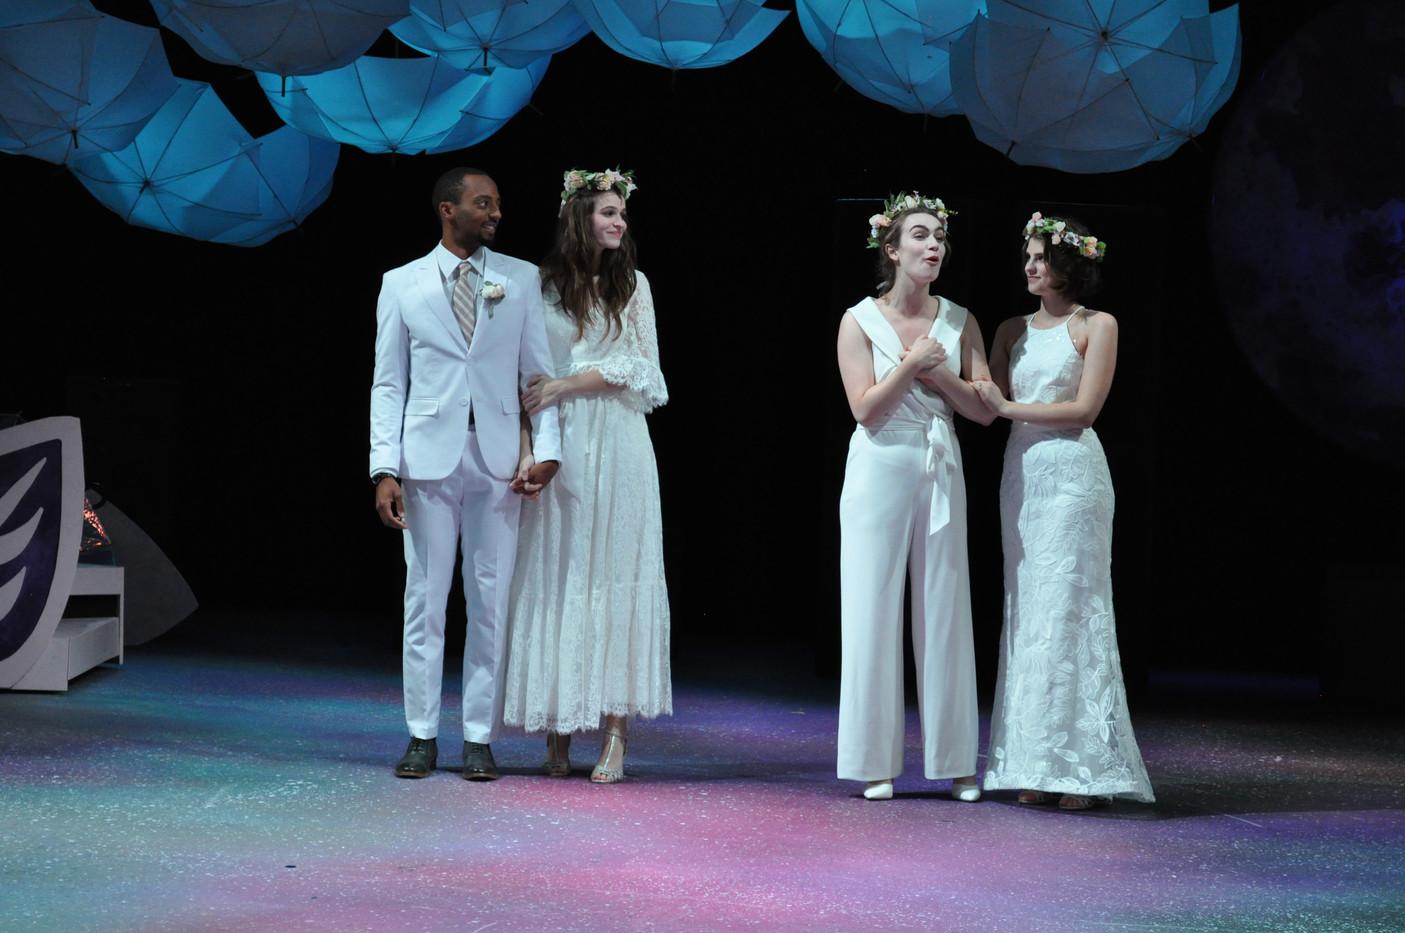 Demetrius, Helena, Lysander, and Hermia